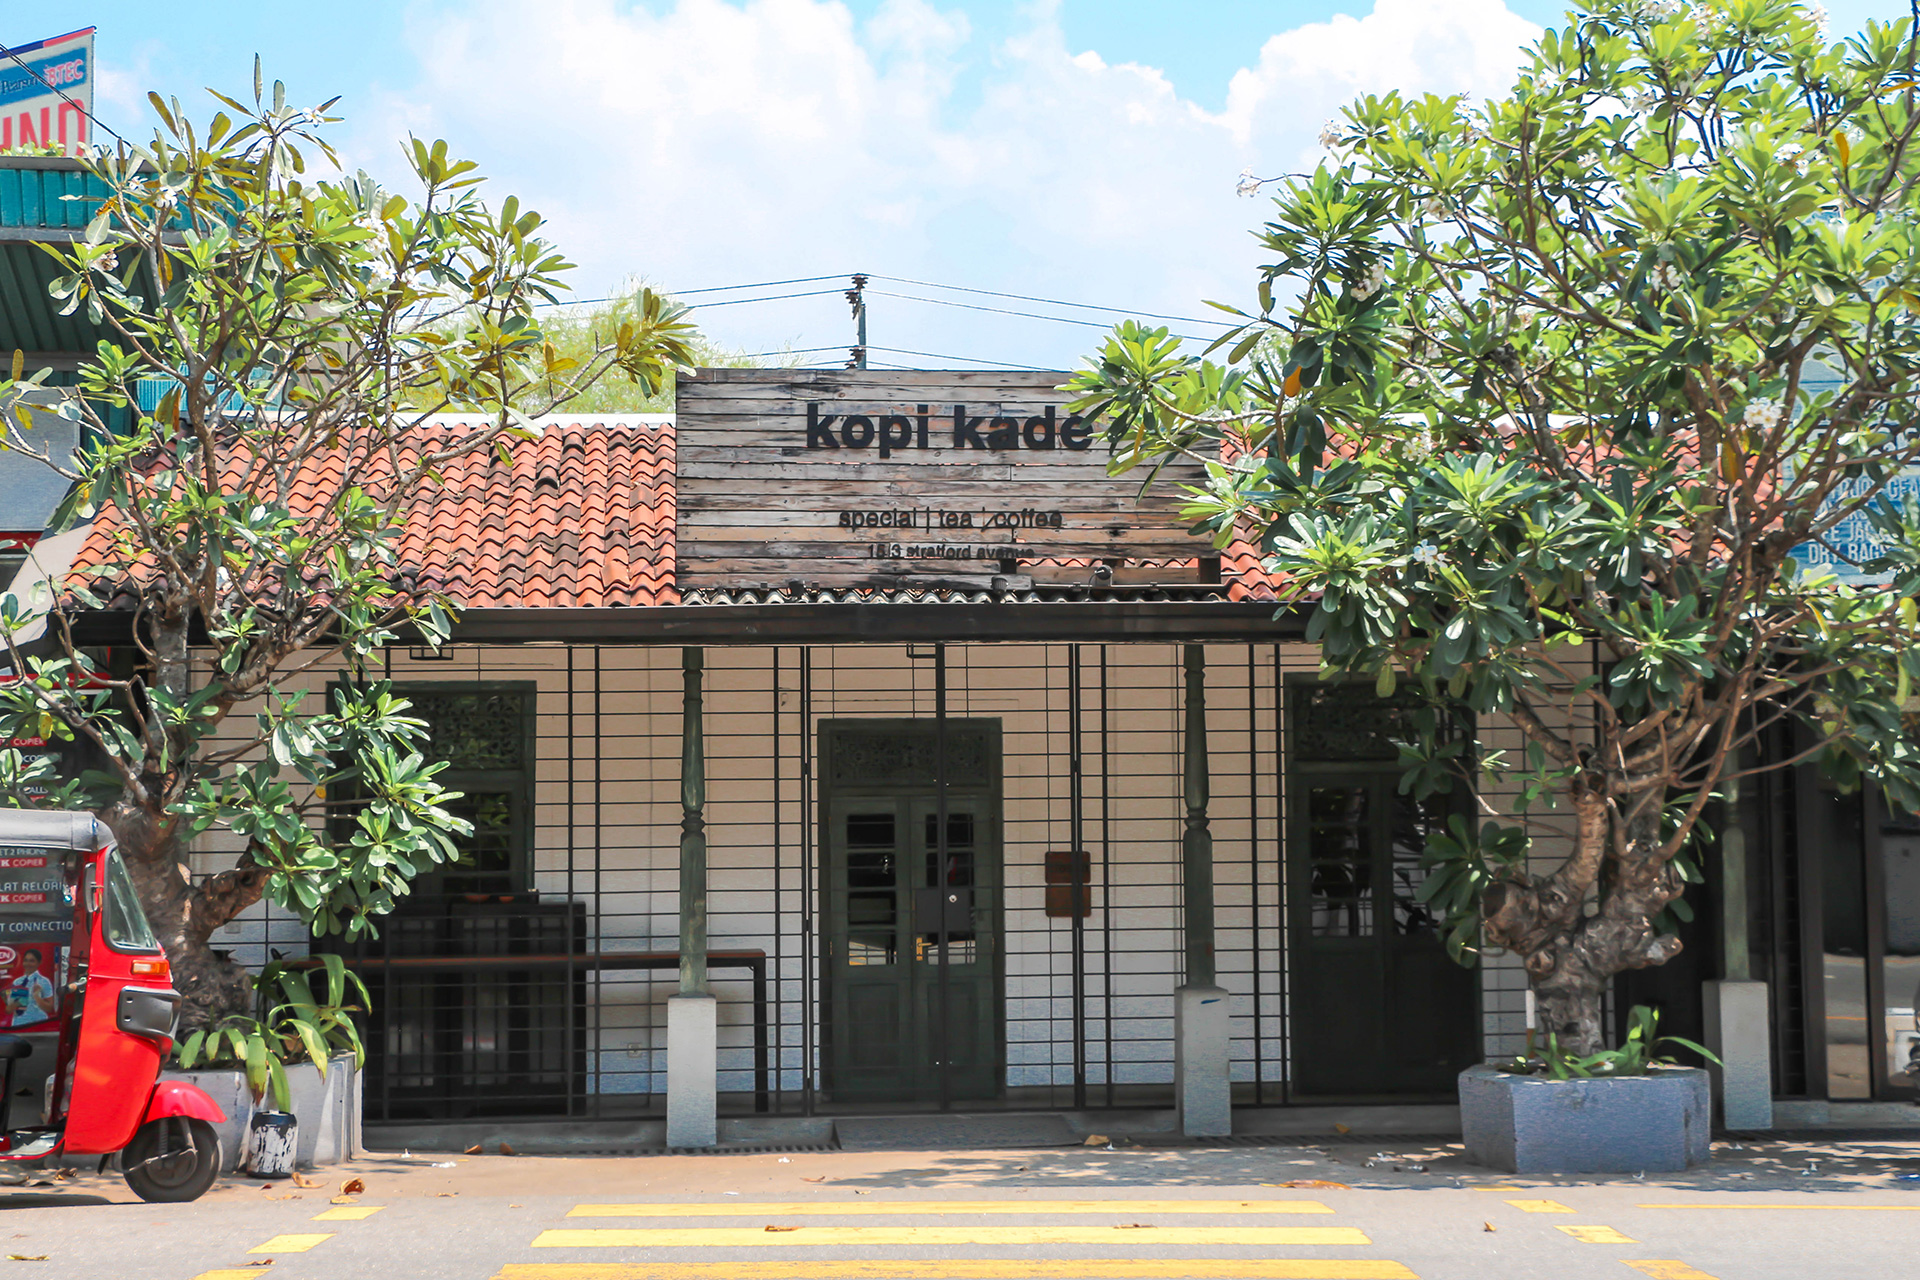 In Sri Lanka, Kopi Kade Brings Specialty Coffee To The Capital City photo